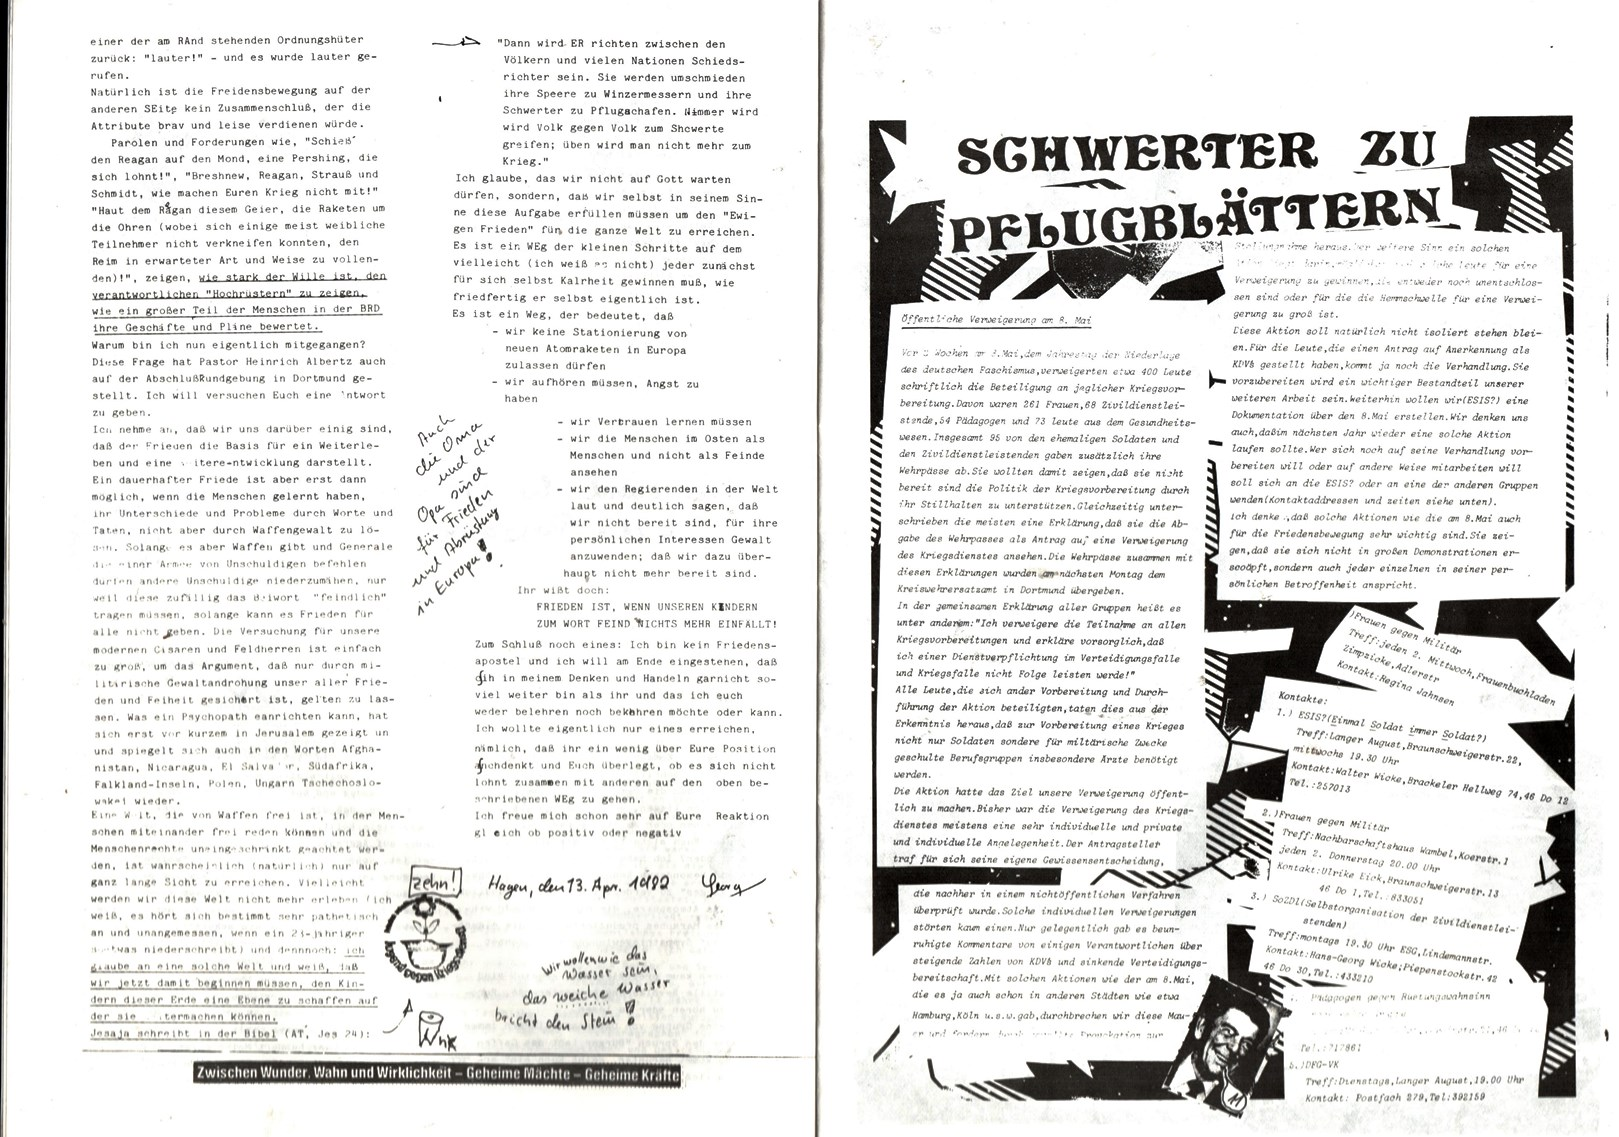 Dortmund_Uni_Spatz_19820600_006